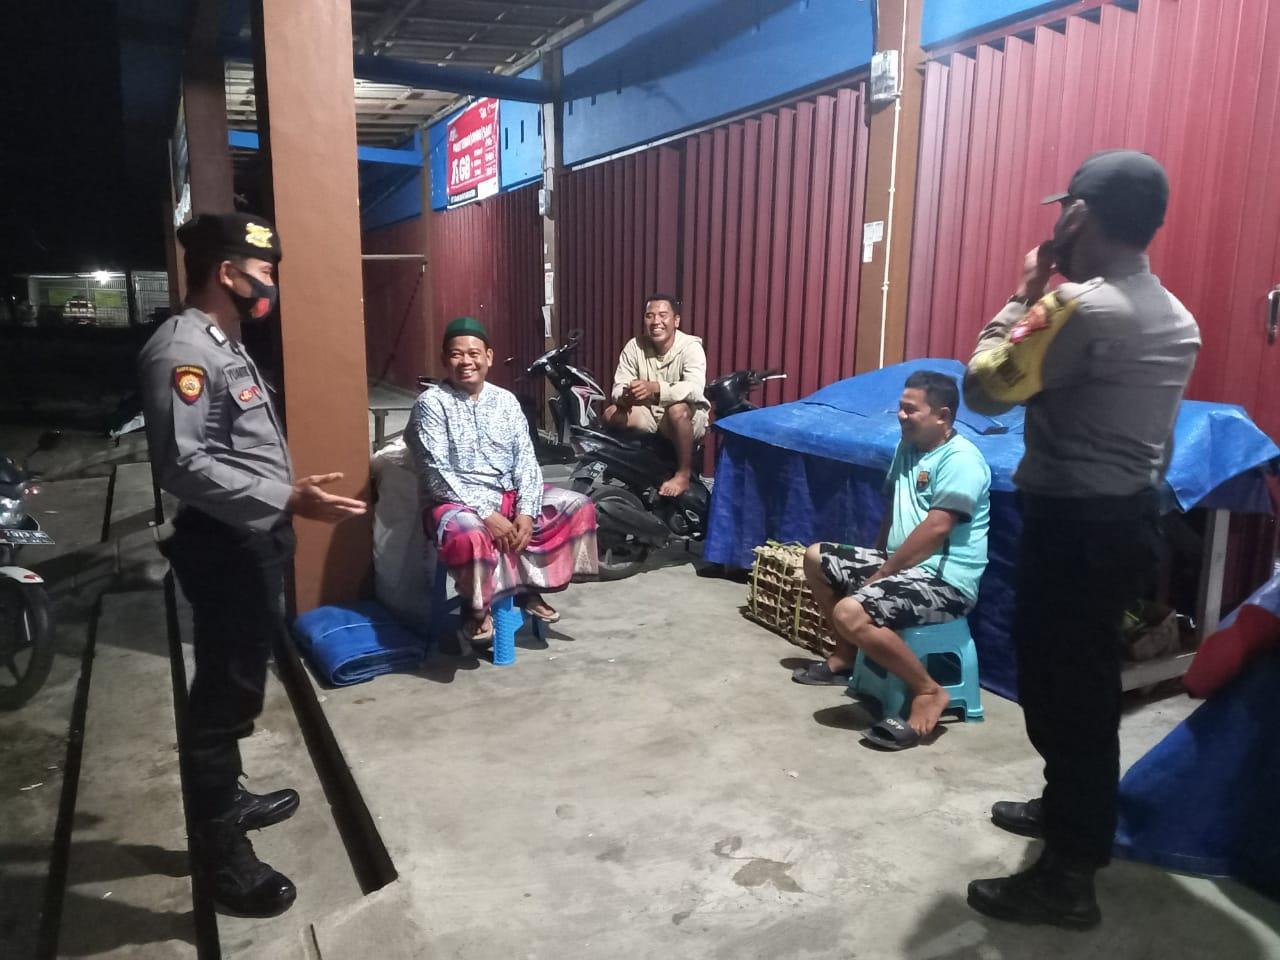 Wujudkan Pilkada Damai, Personel Polsek Maliku Sambangi Tokoh Masyarakat